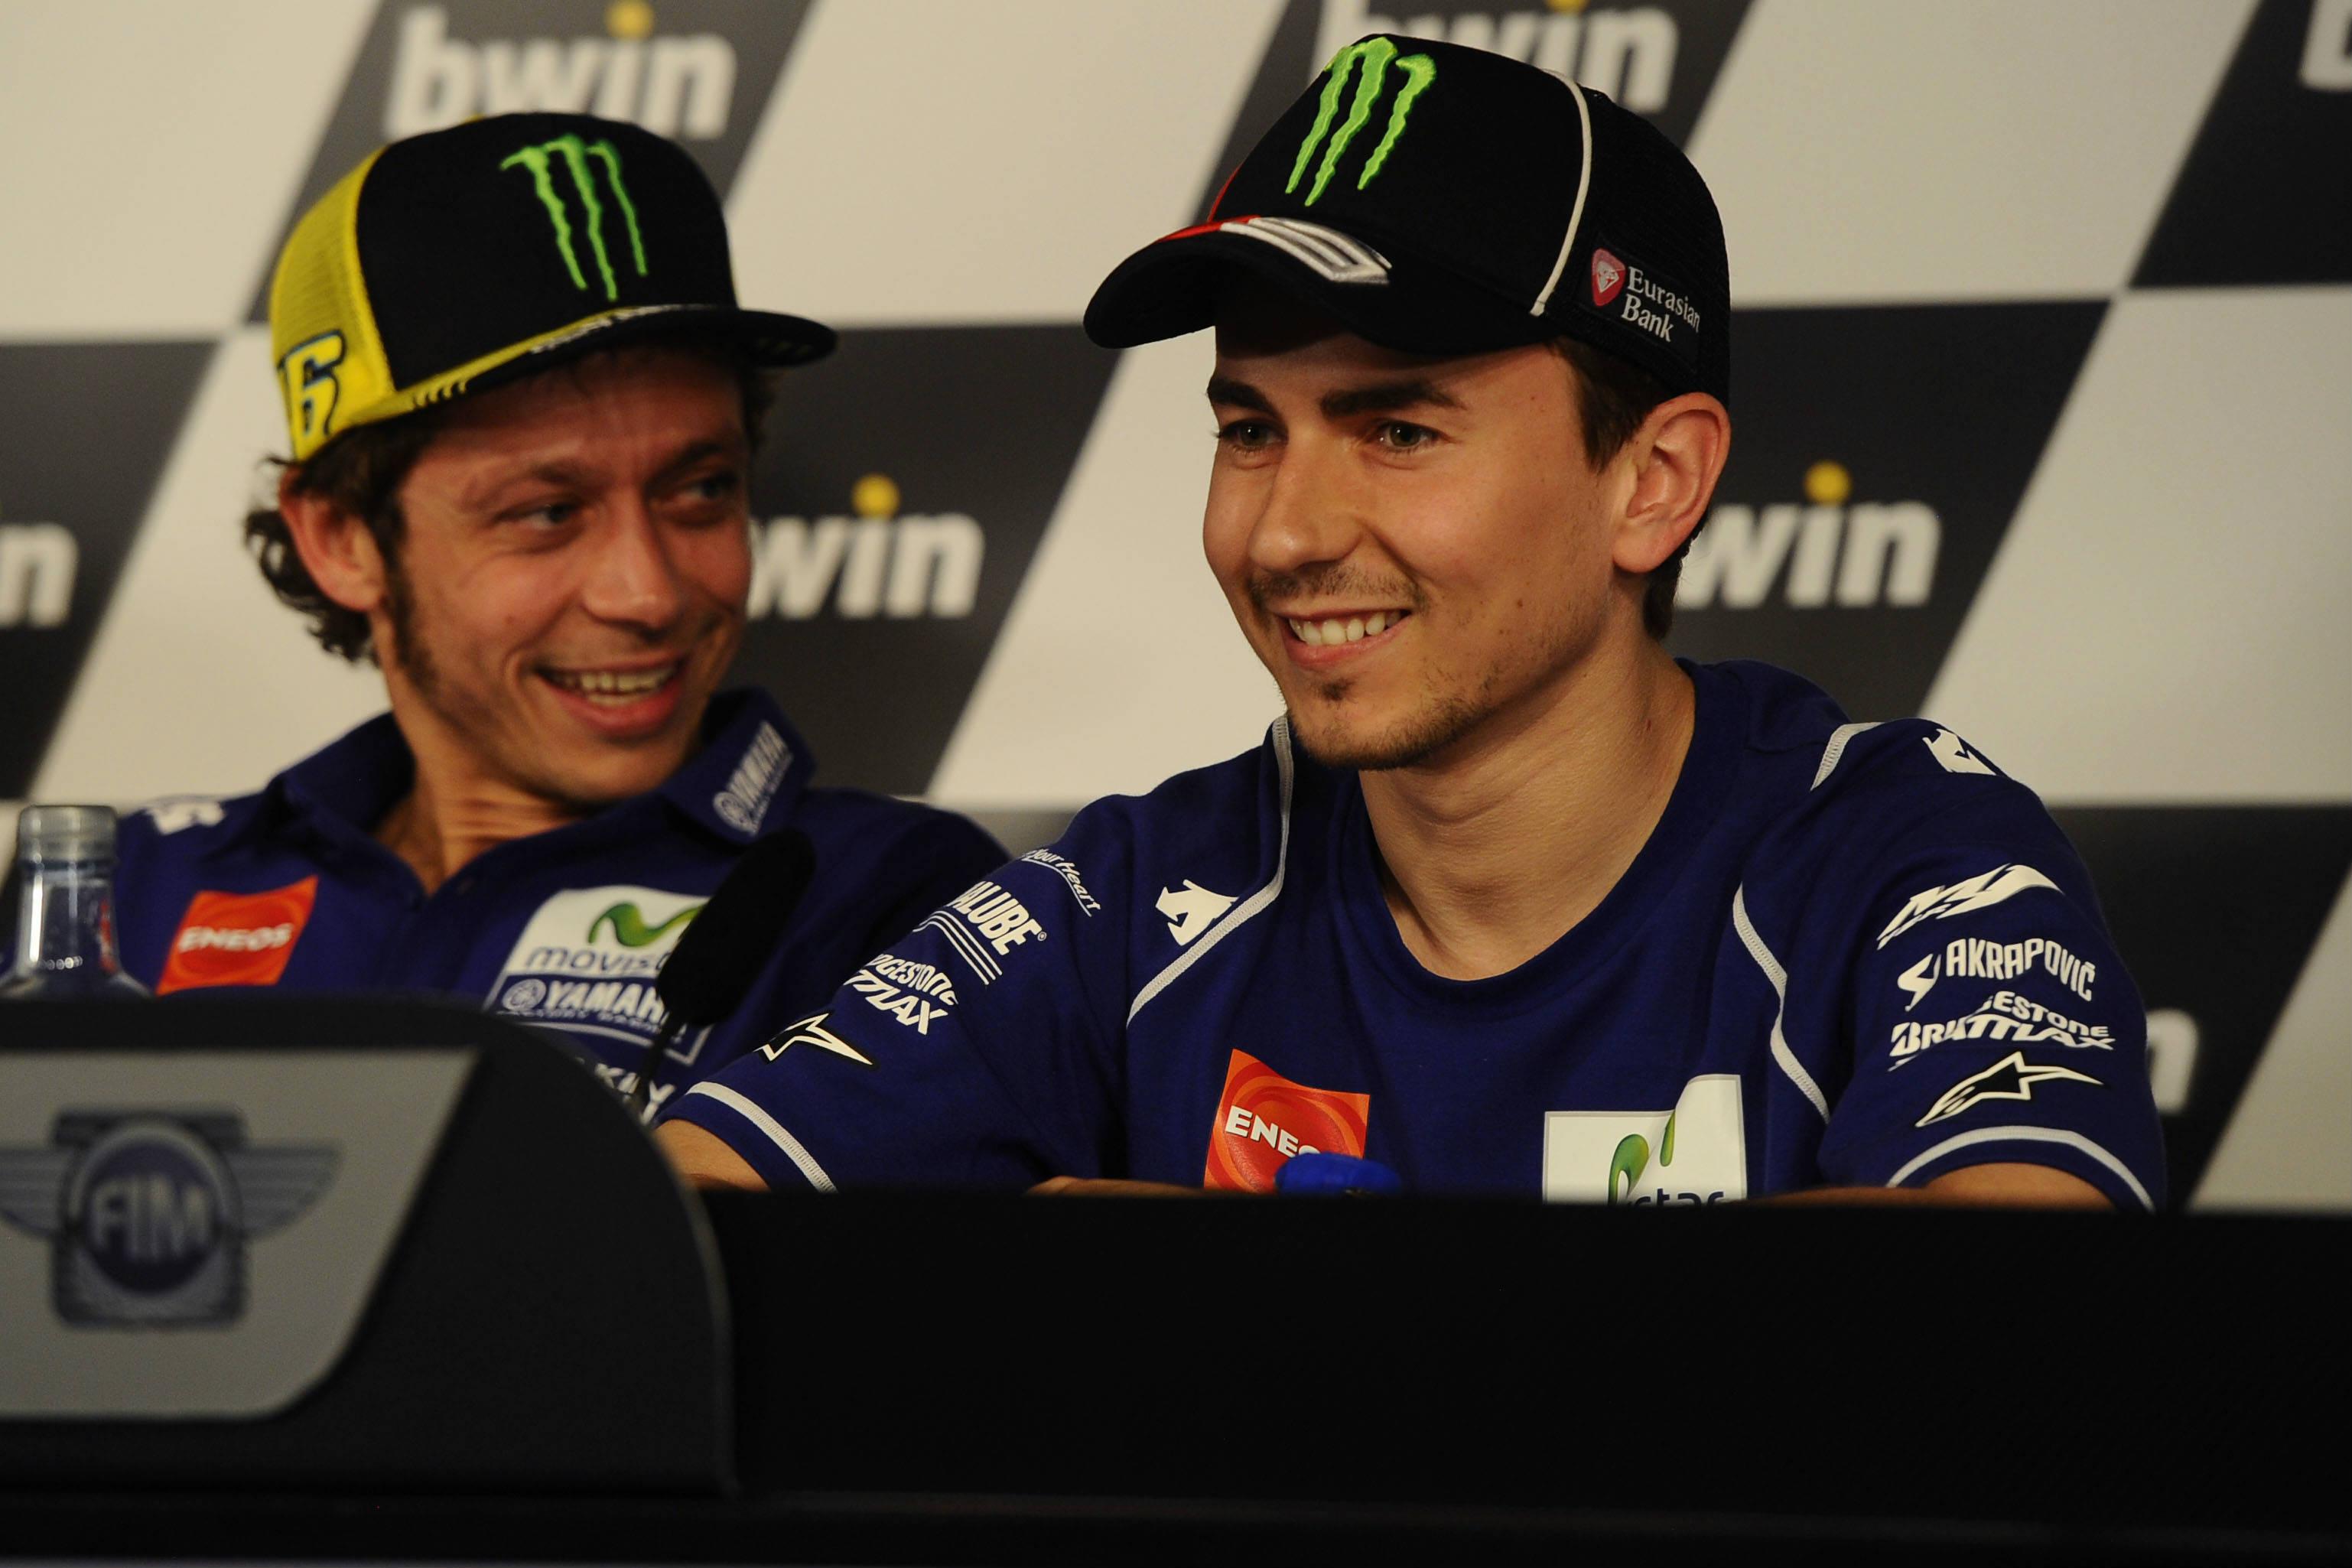 Lorenzo continuará en Yamaha la próxima temporada